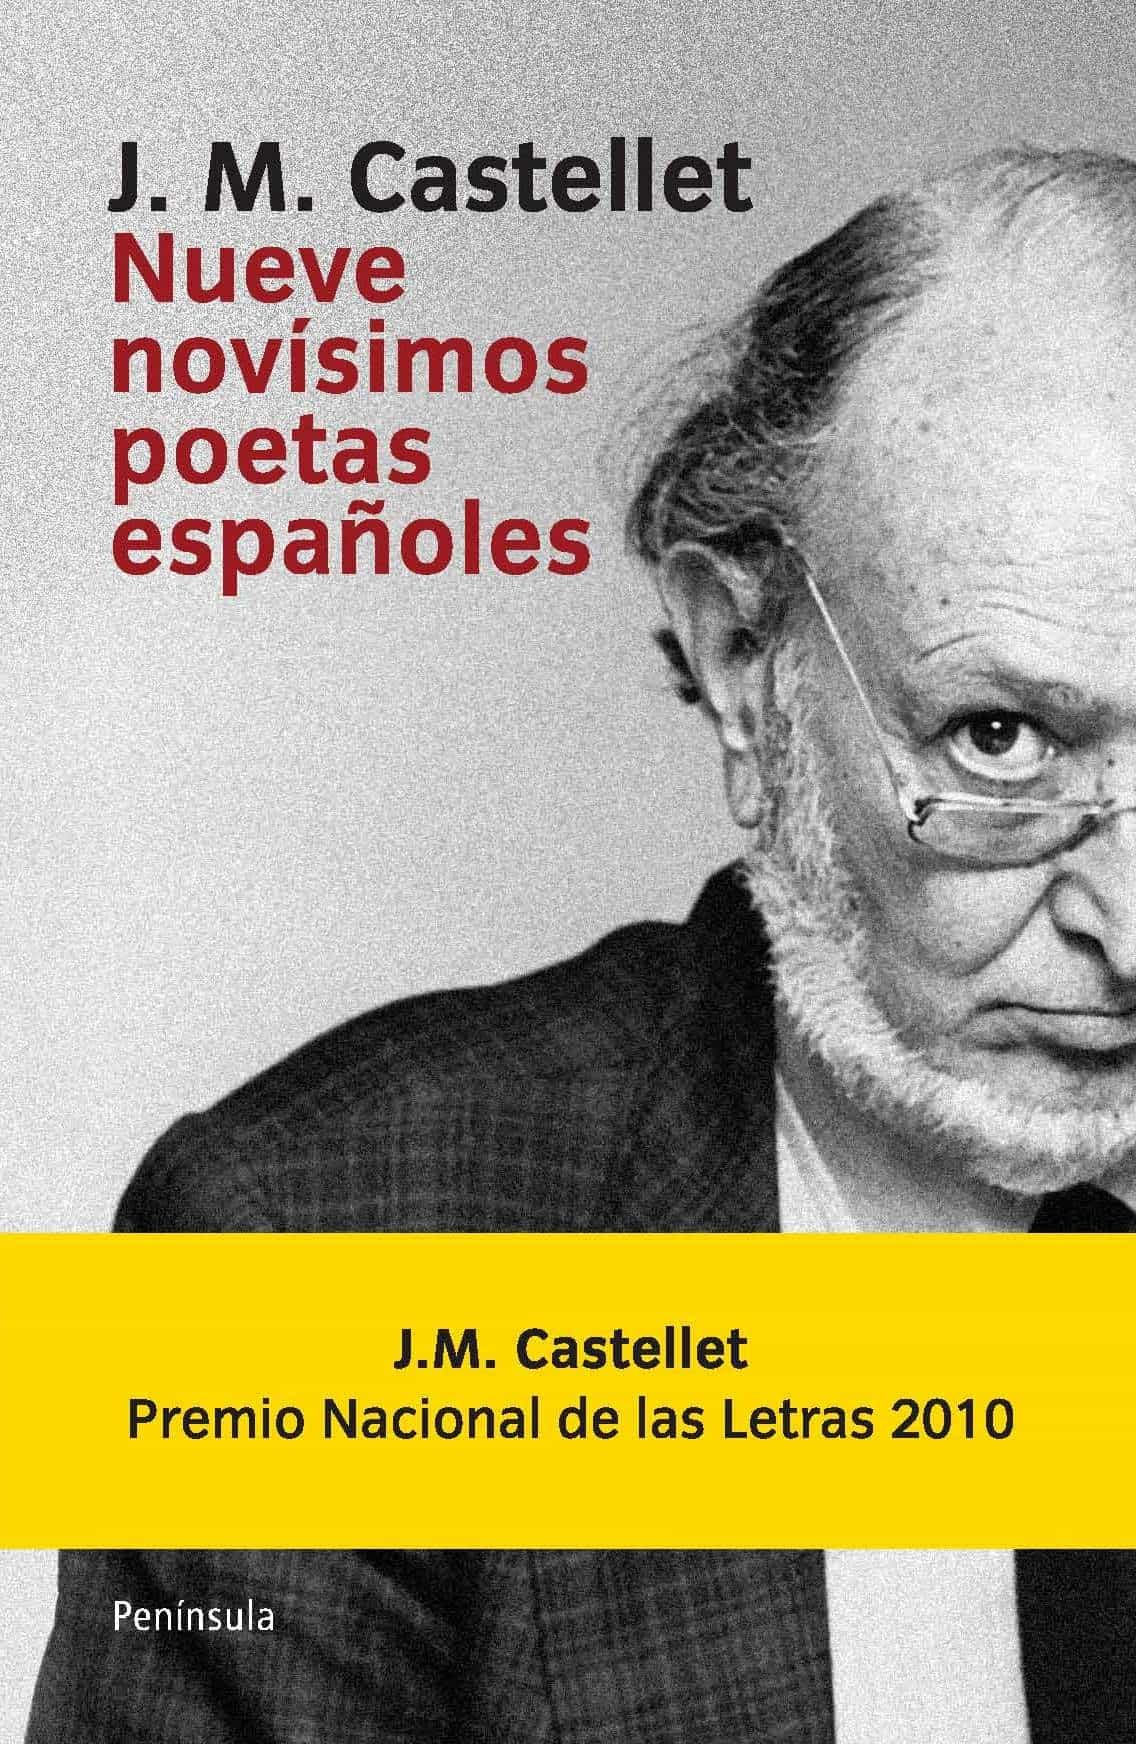 nueve novisimos poetas españoles-jose maria castellet-9788499420882